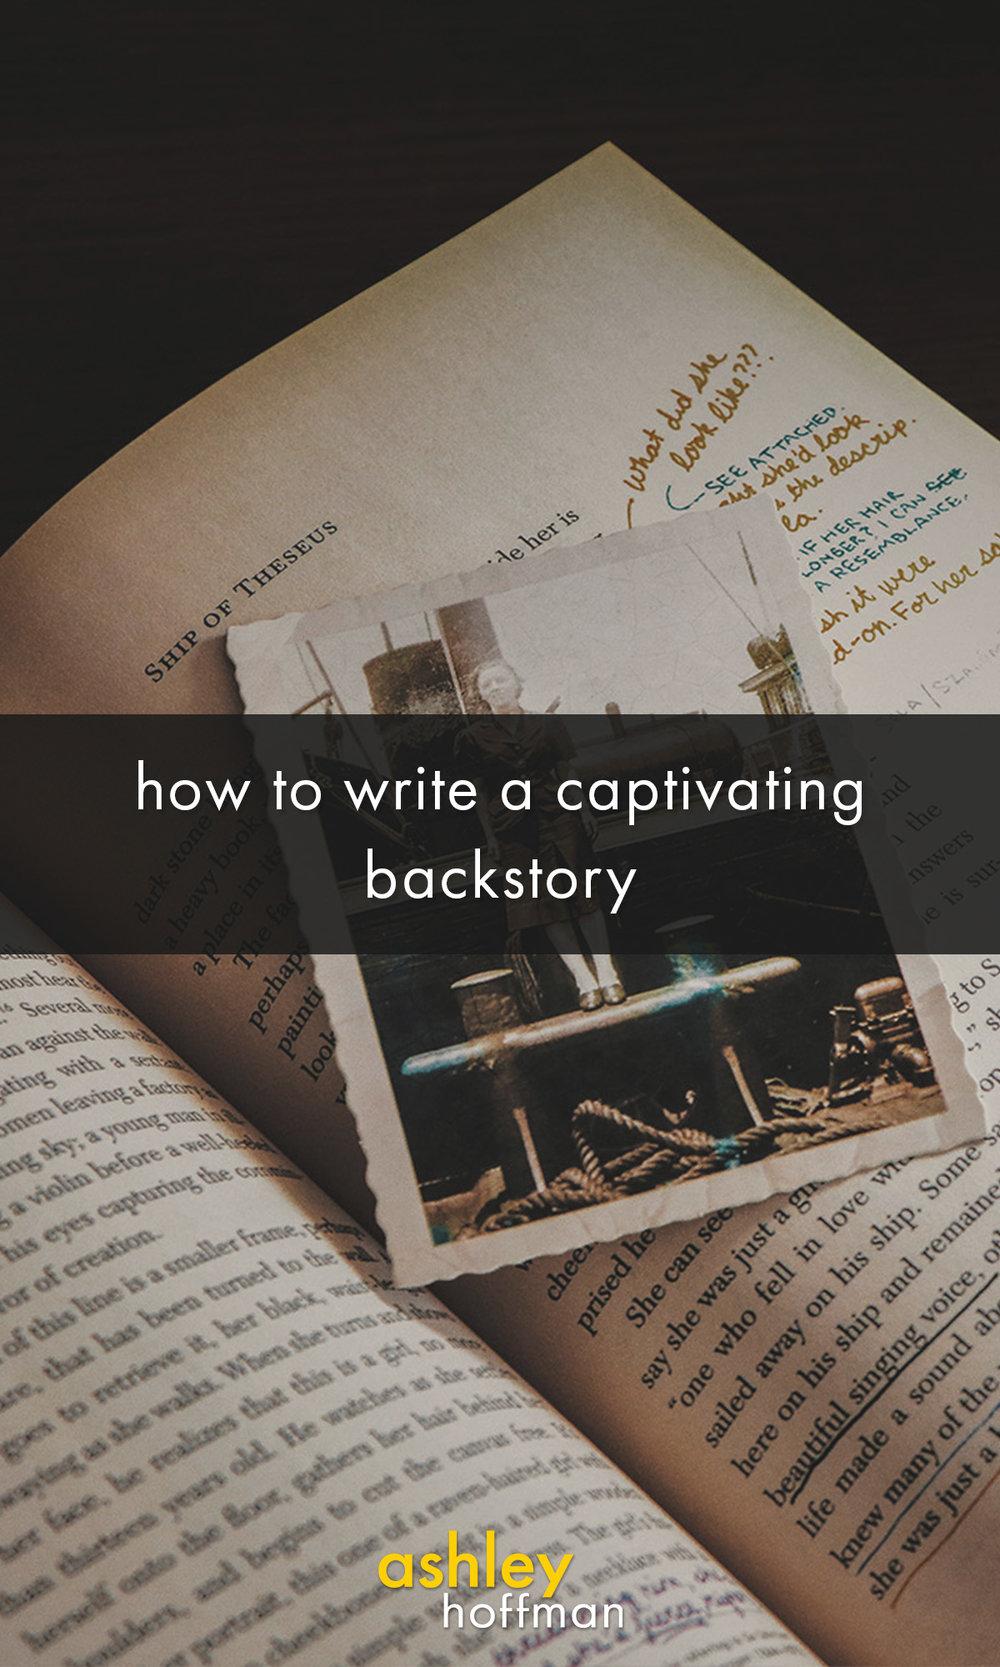 how-to-write-a-captivating-backstory-pinterest.jpg